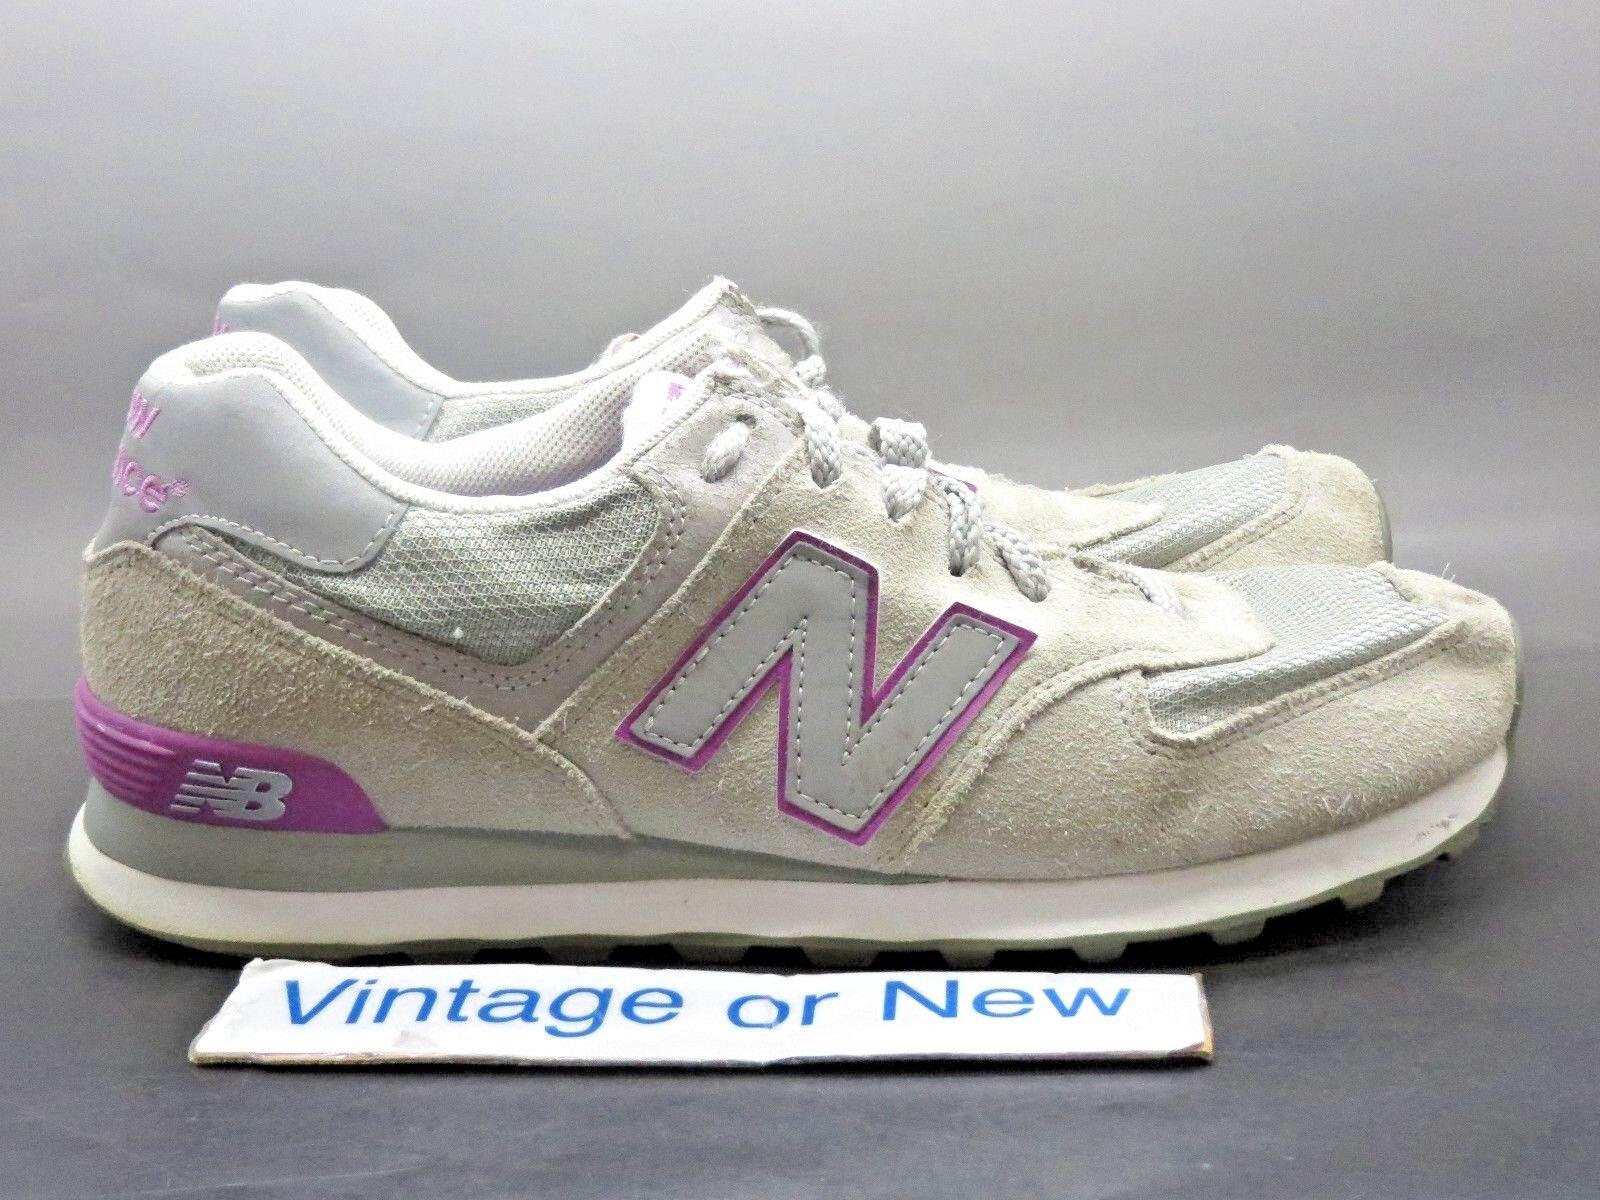 Women's New Balance 574 Grey Purple Suede WL574GCV Running shoes sz 10 B